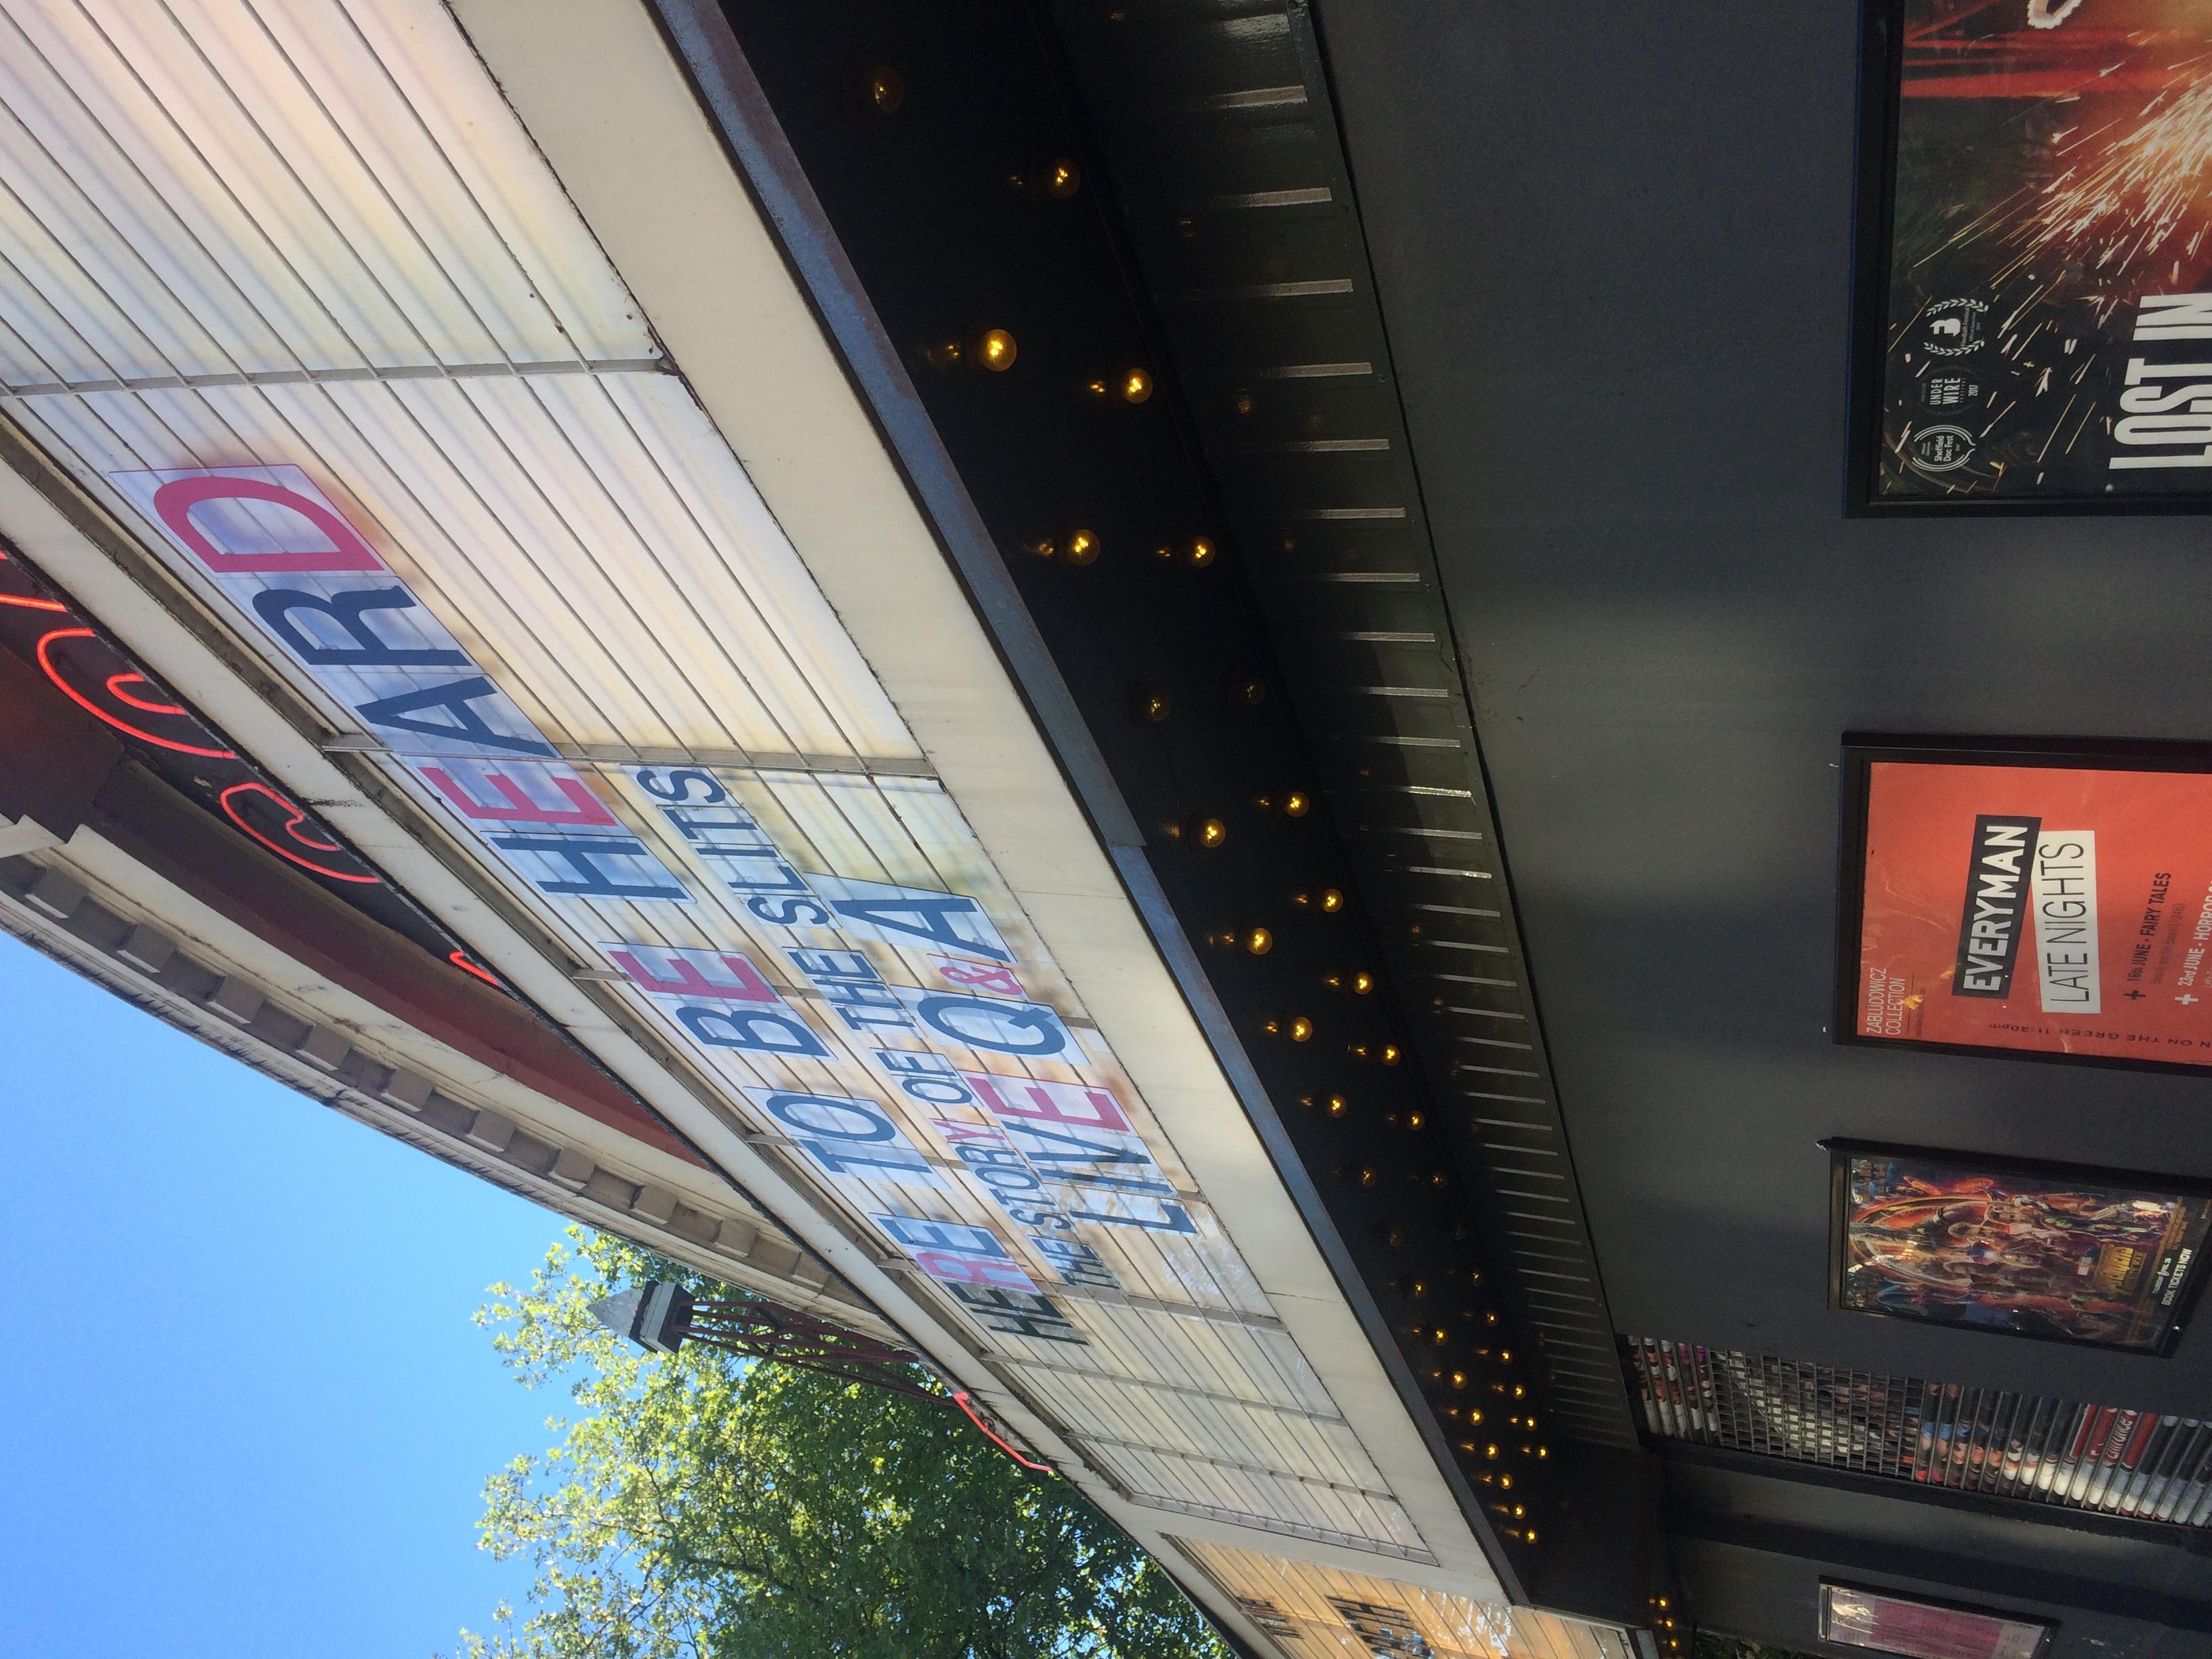 Camden Town Brewery Named Headline Partner of Everyman Music Film Festival